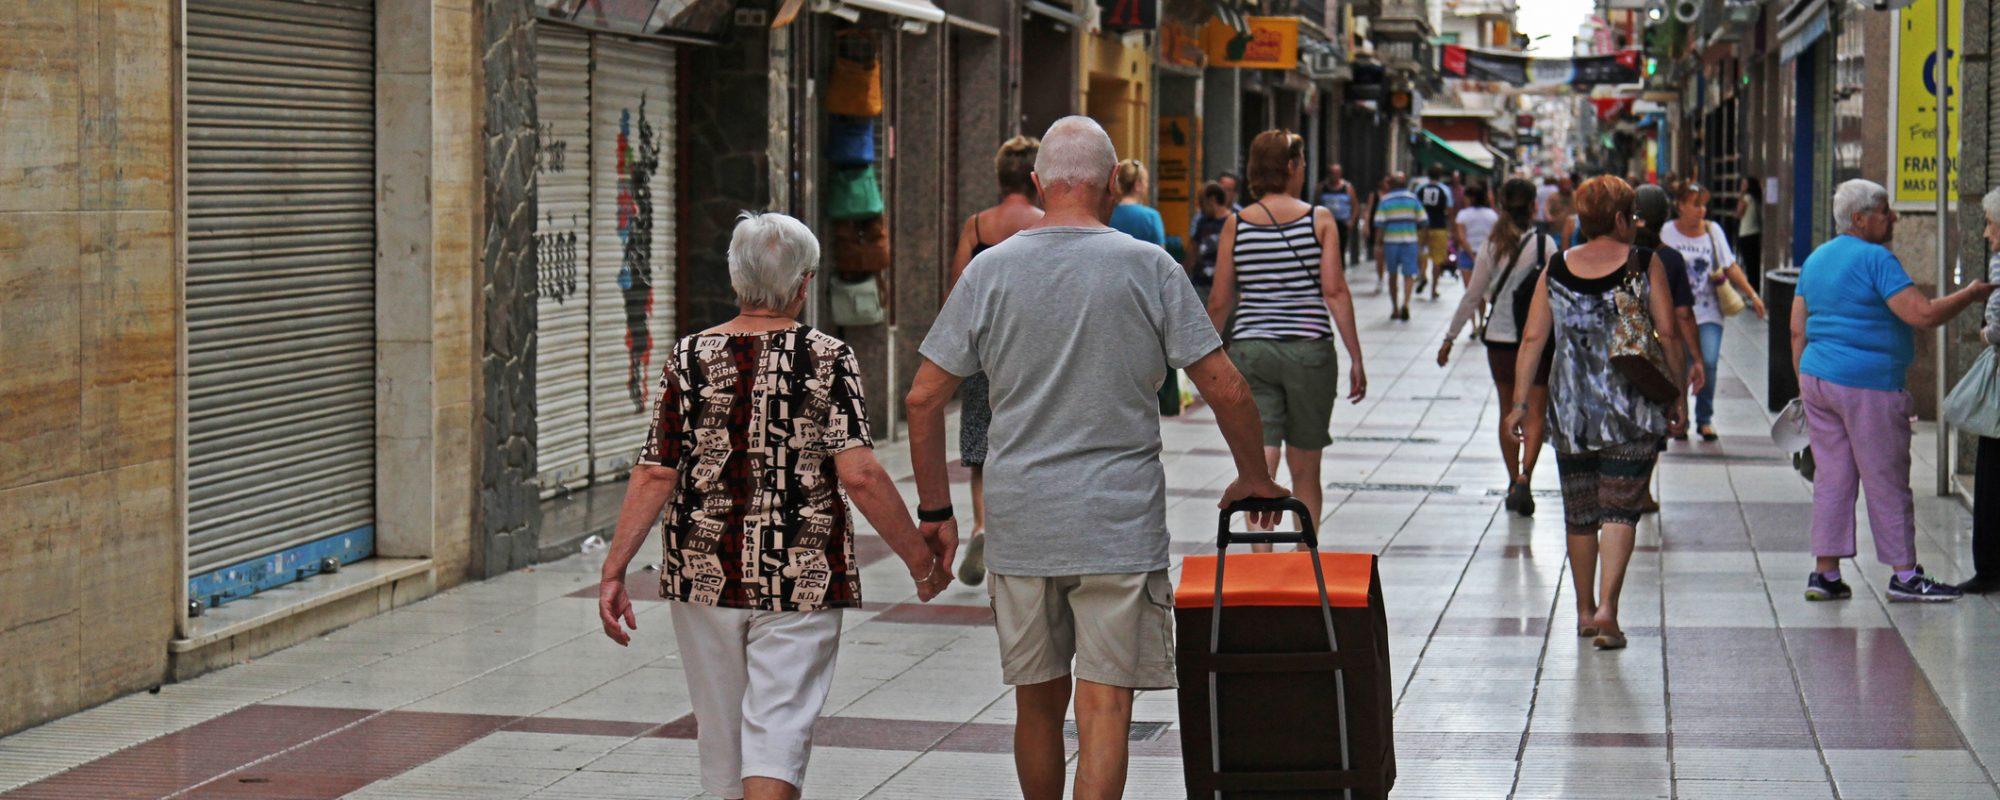 Calella, Spain - September 13, 2014: Rear view of people walking  on a pedestrian street Carrer Esglesia in Calella